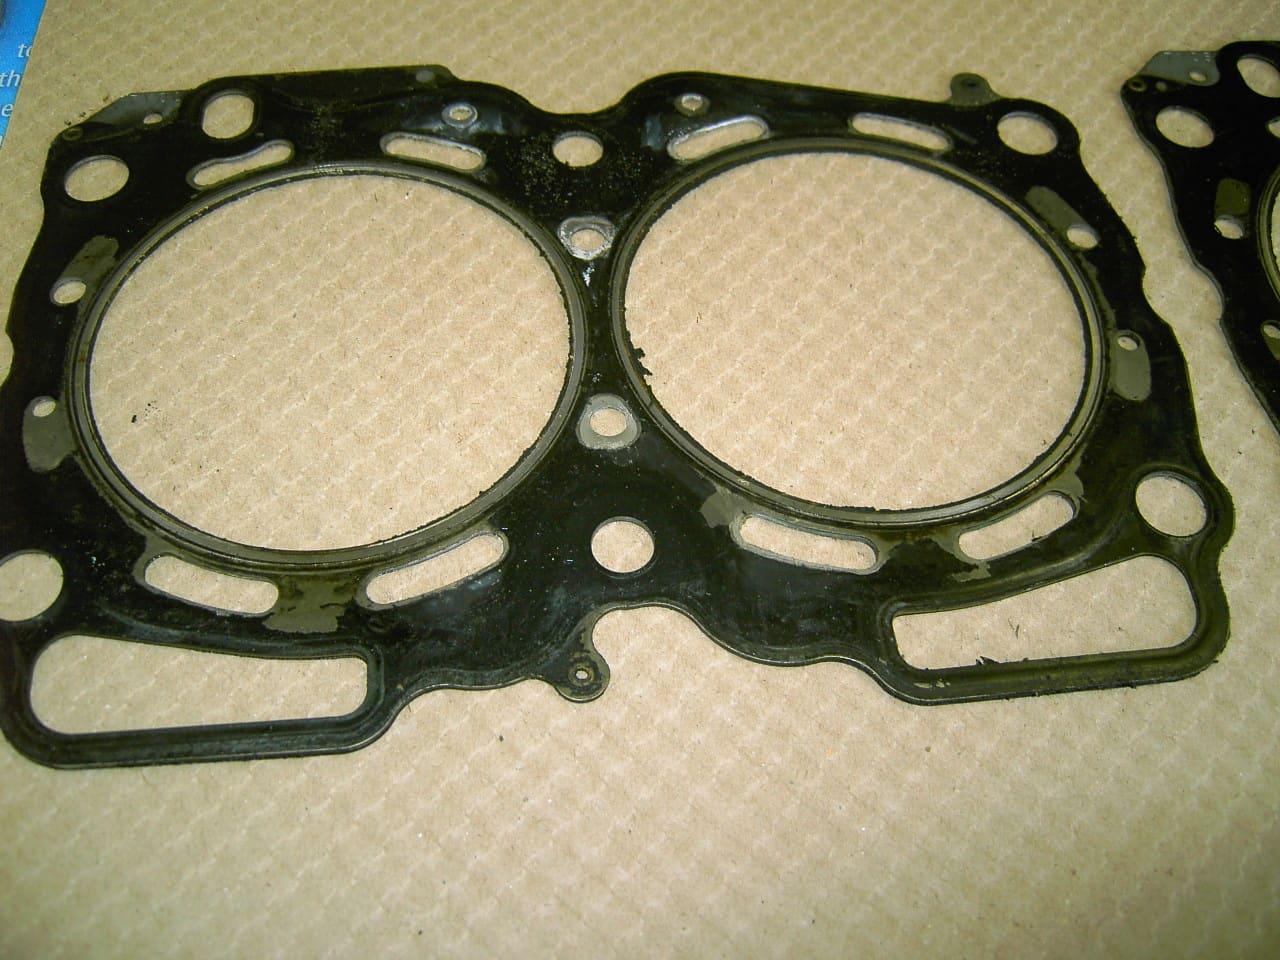 Rotors Metallic Pads F+R OE Replacement 99 00 01 Fits Subaru Impreza 2.5L RS